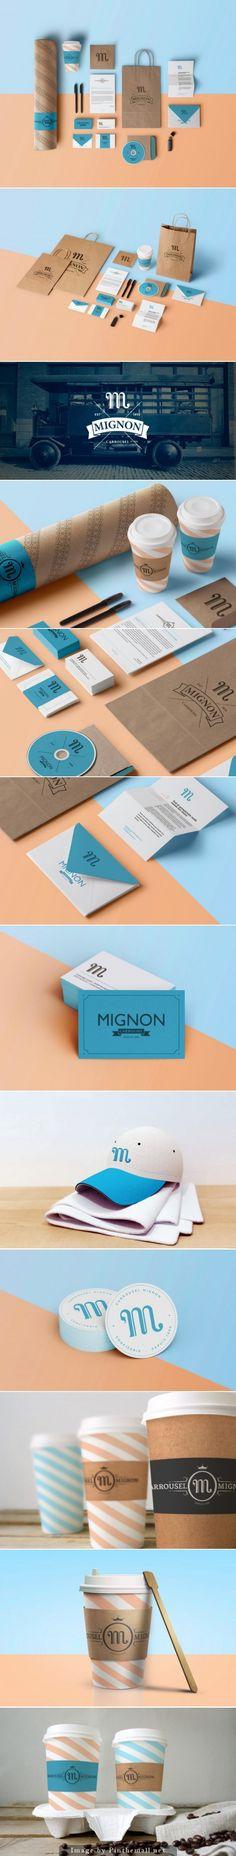 Cool Brand Identity Design. Mignon. #branding #brandidentity [http://www.pinterest.com/alfredchong/]